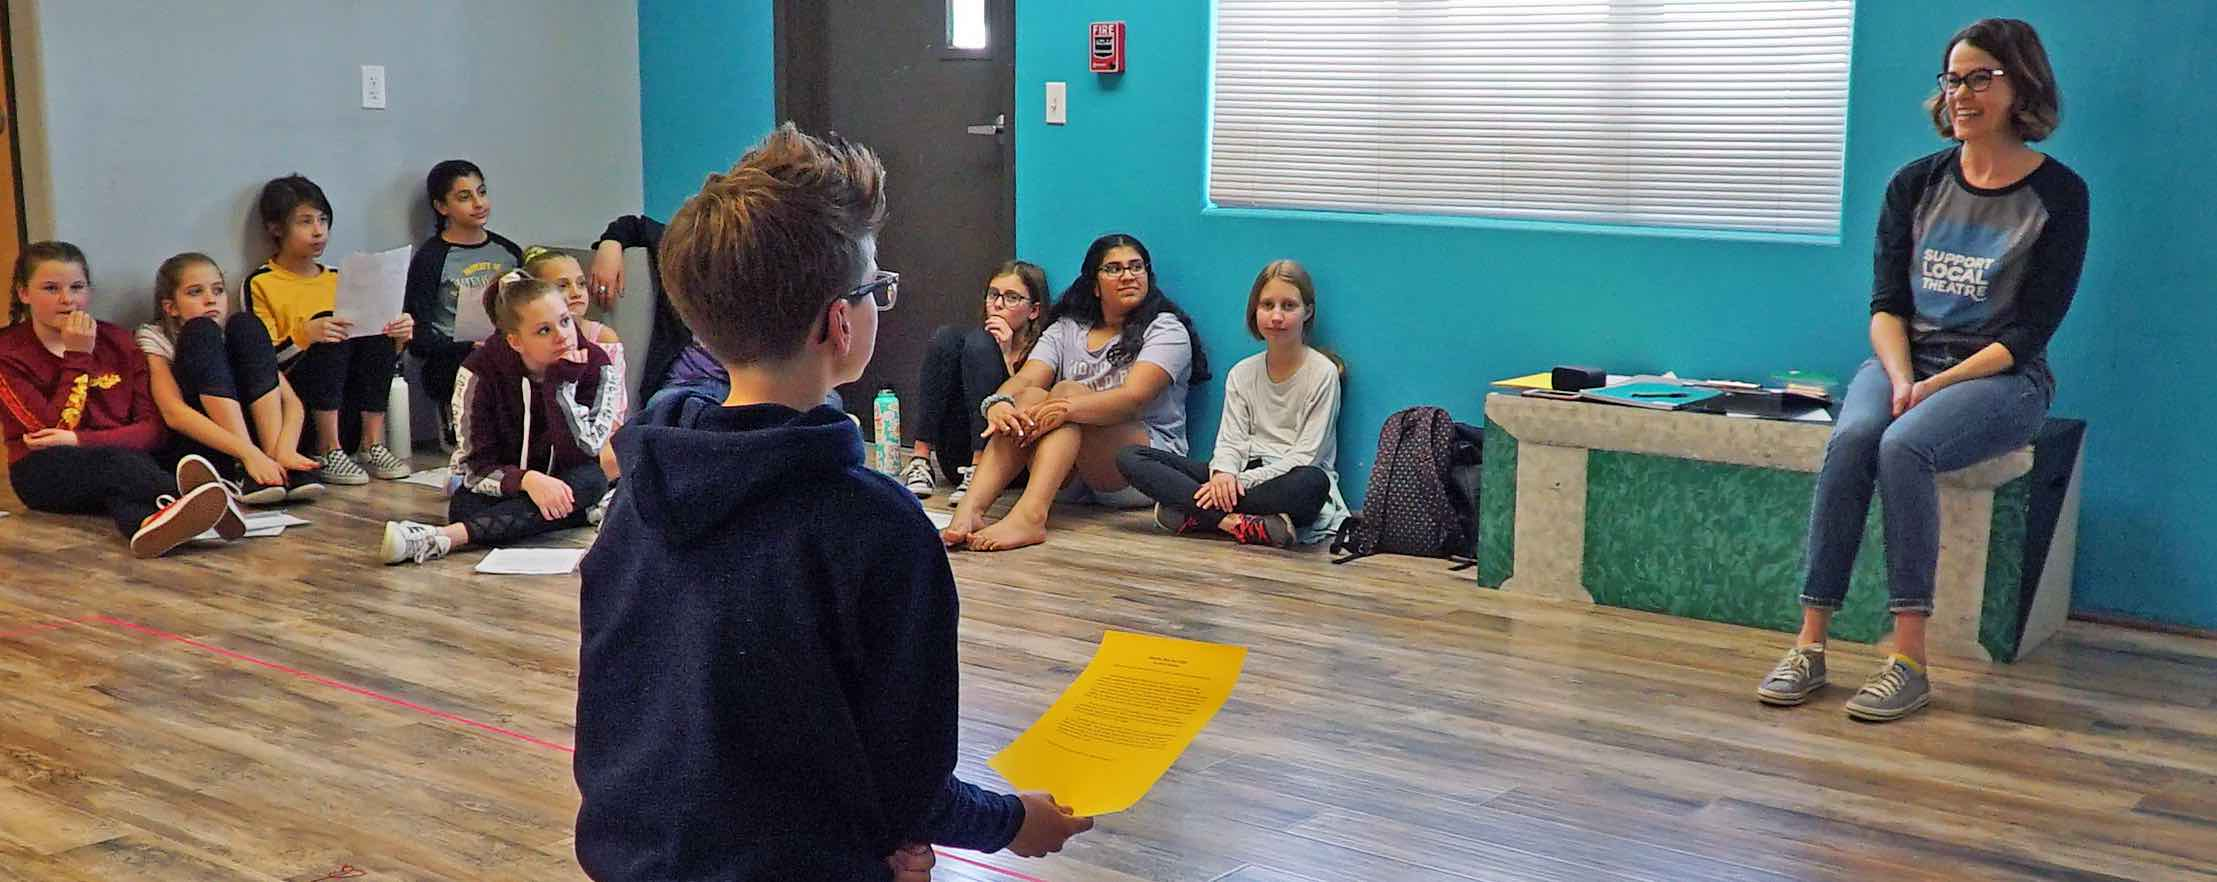 Kat Bailes Monologue Workshop: in REVIEW